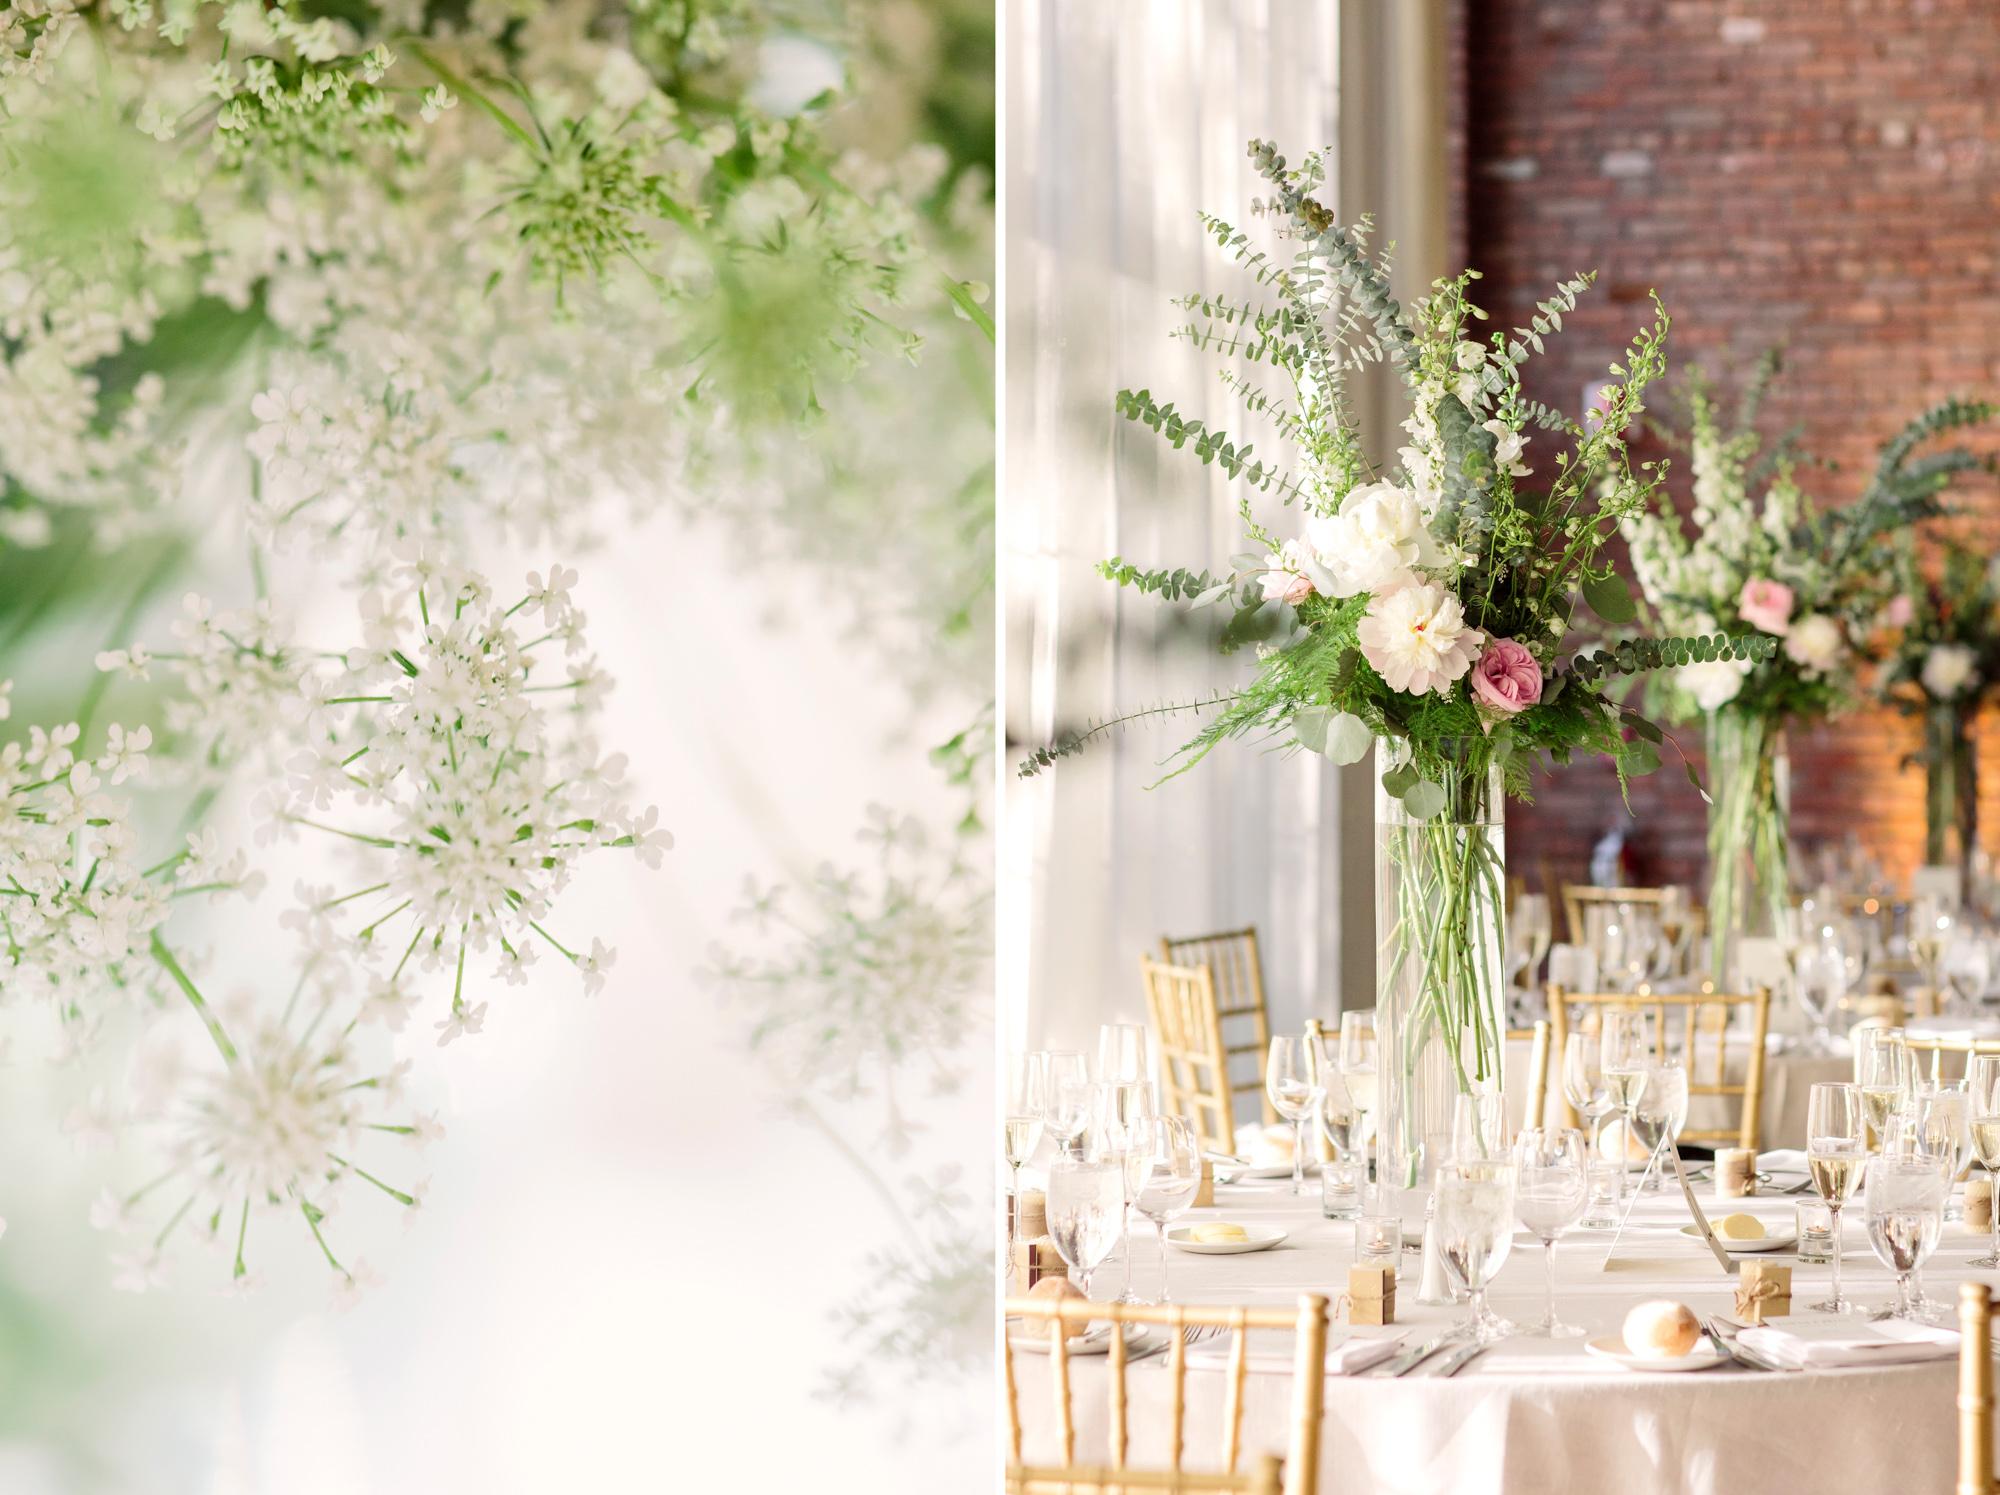 58_Rowan_Brian_The_Roundhouse_Wedding_Beacon_NY_Tanya_Salazar_Photography.jpg